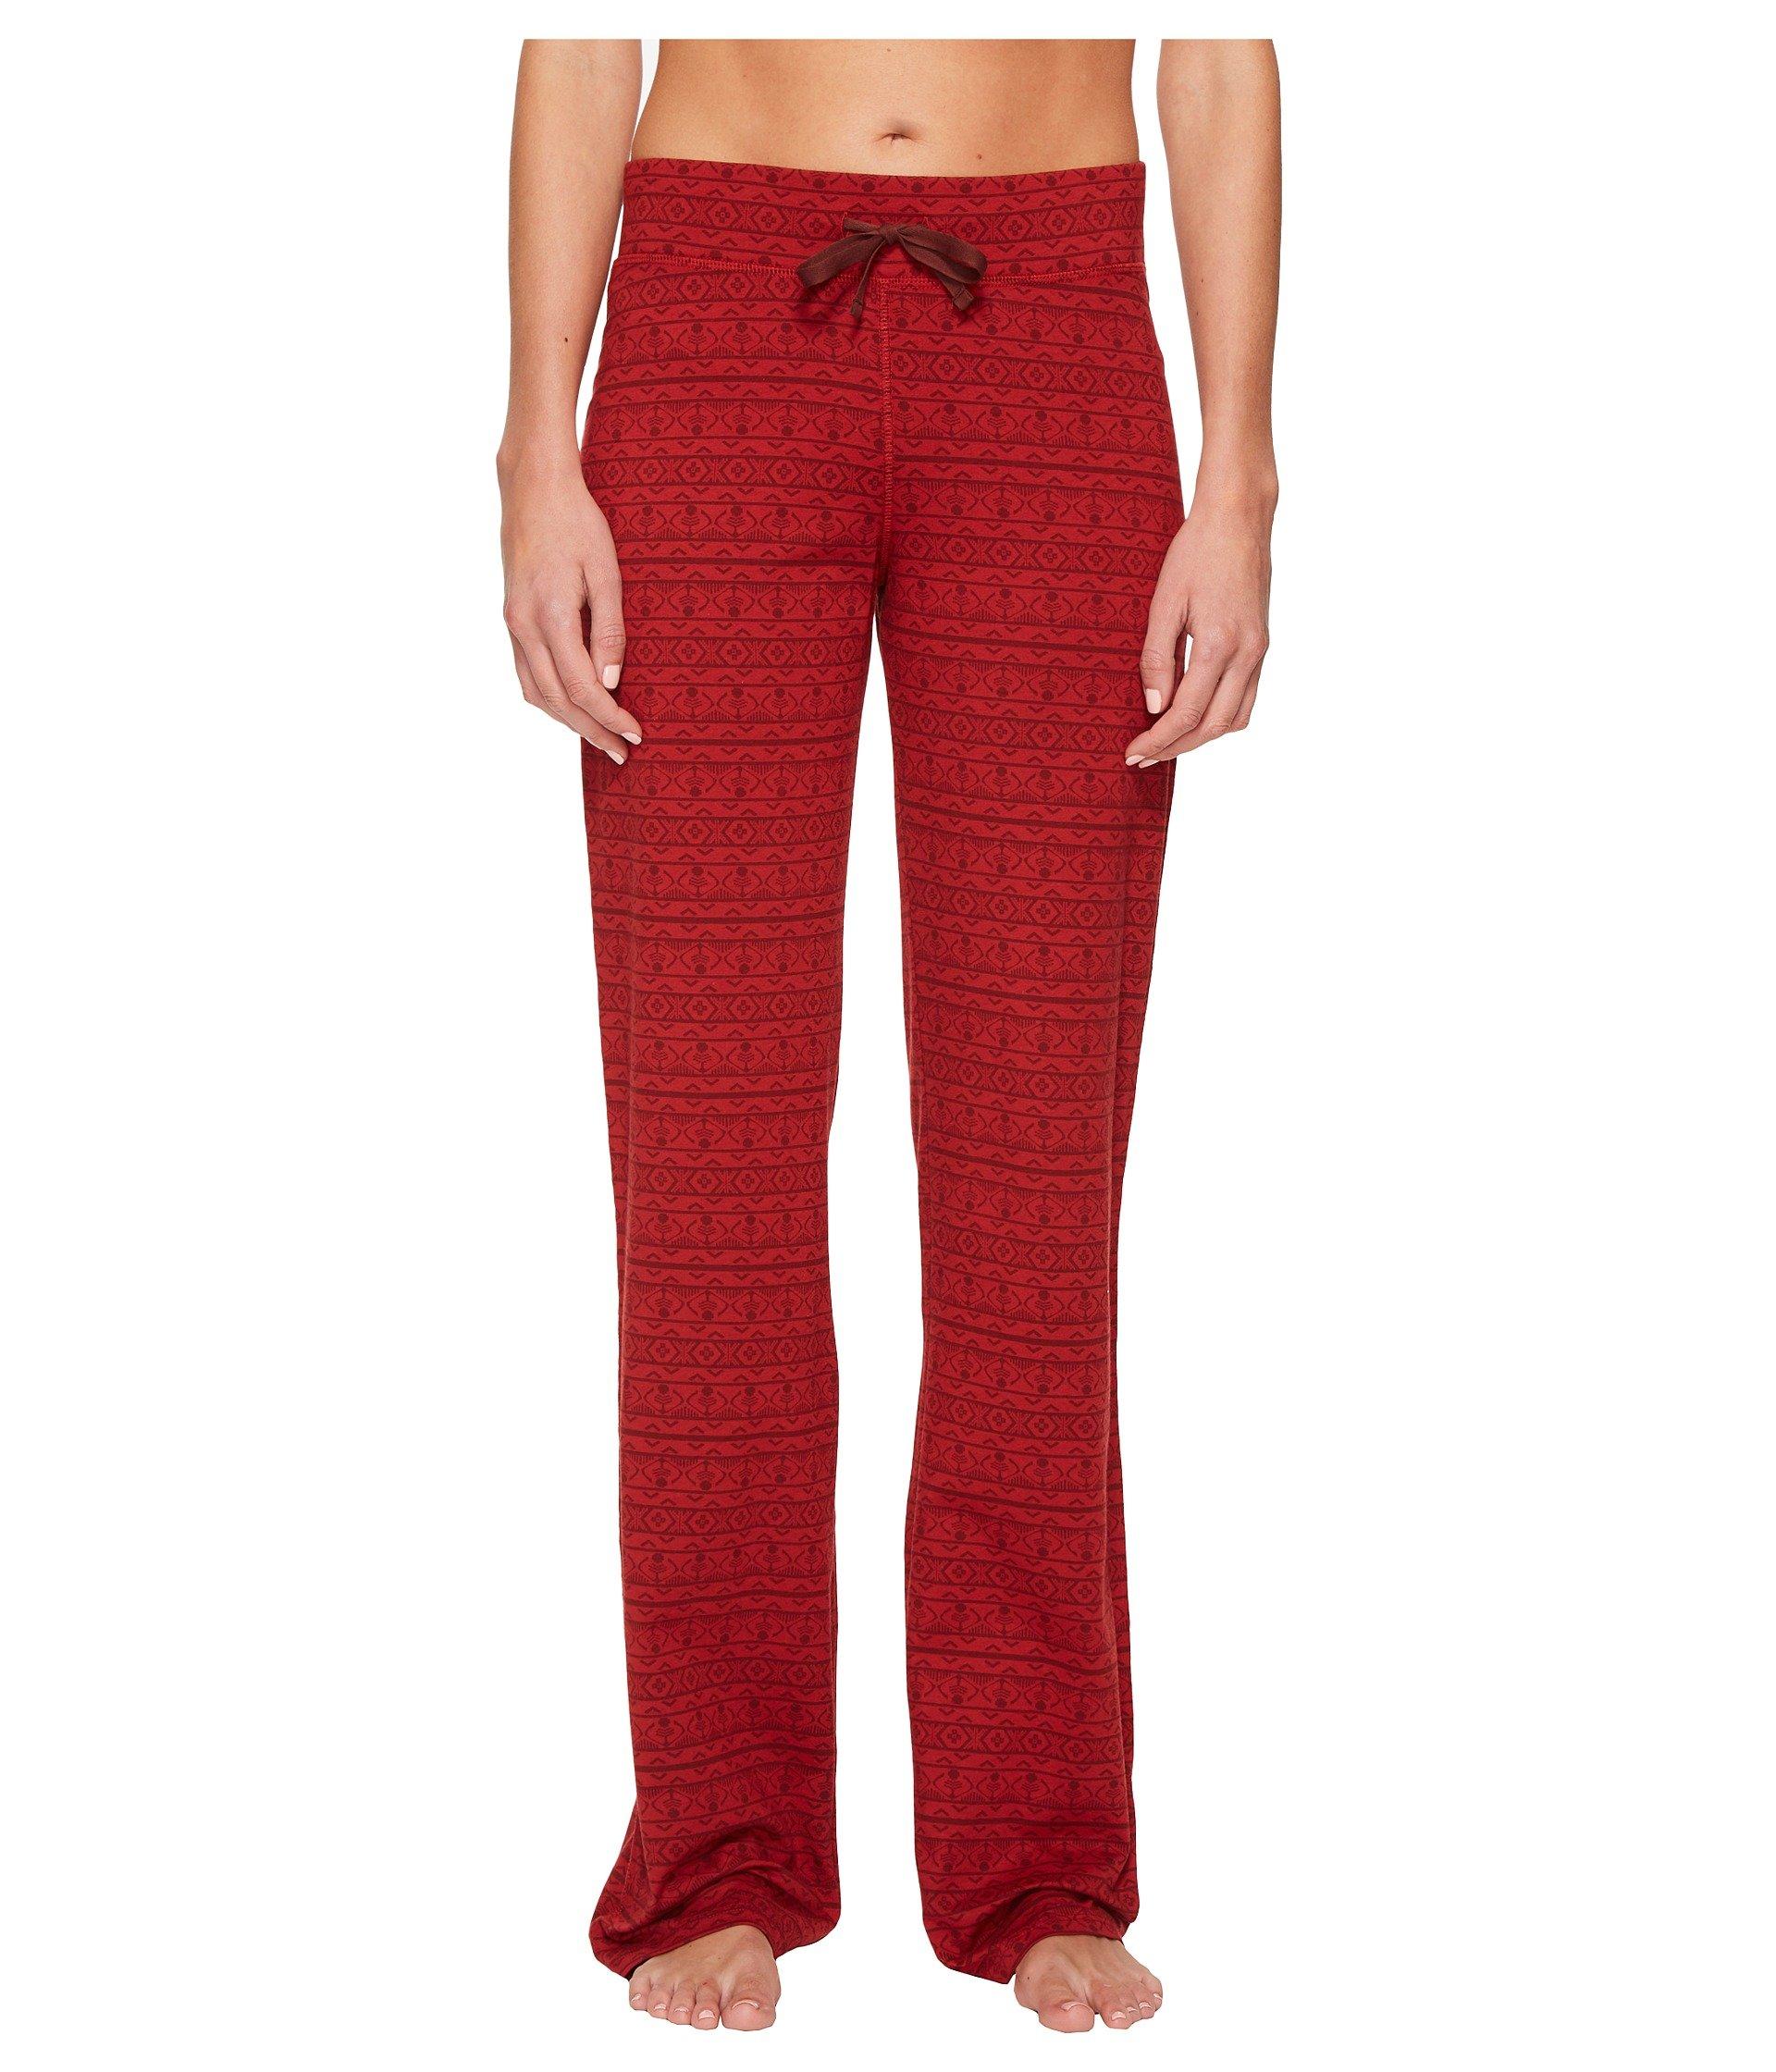 Pantalón de Pijama para Mujer Toadandamp;Co Bedhead Pants  + Toad&Co en VeoyCompro.net